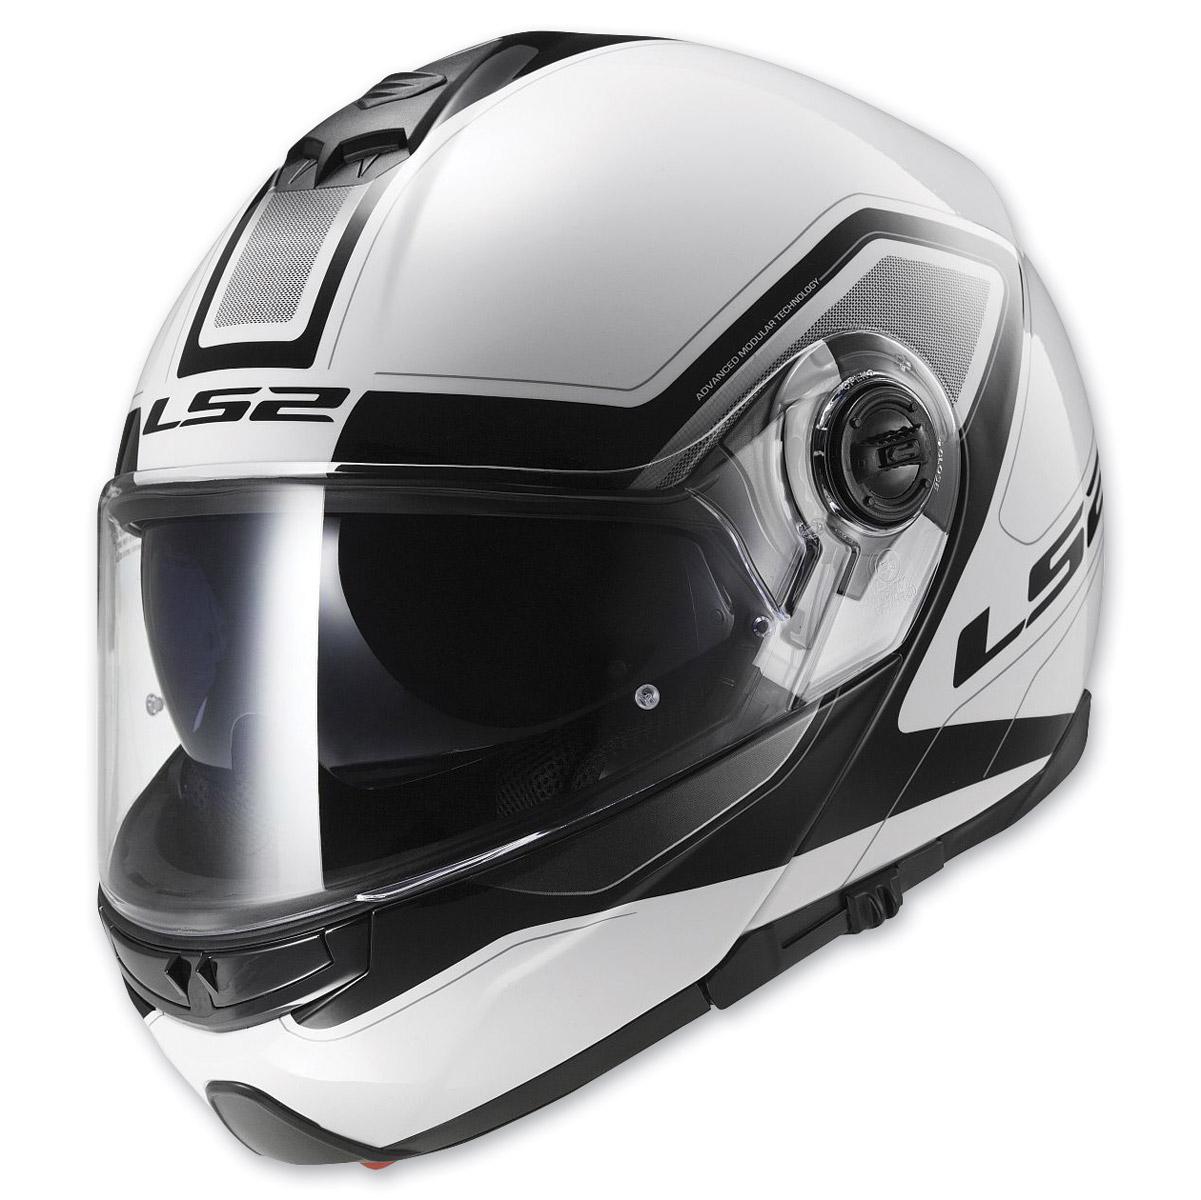 LS2 Strobe Civic White Modular Helmet